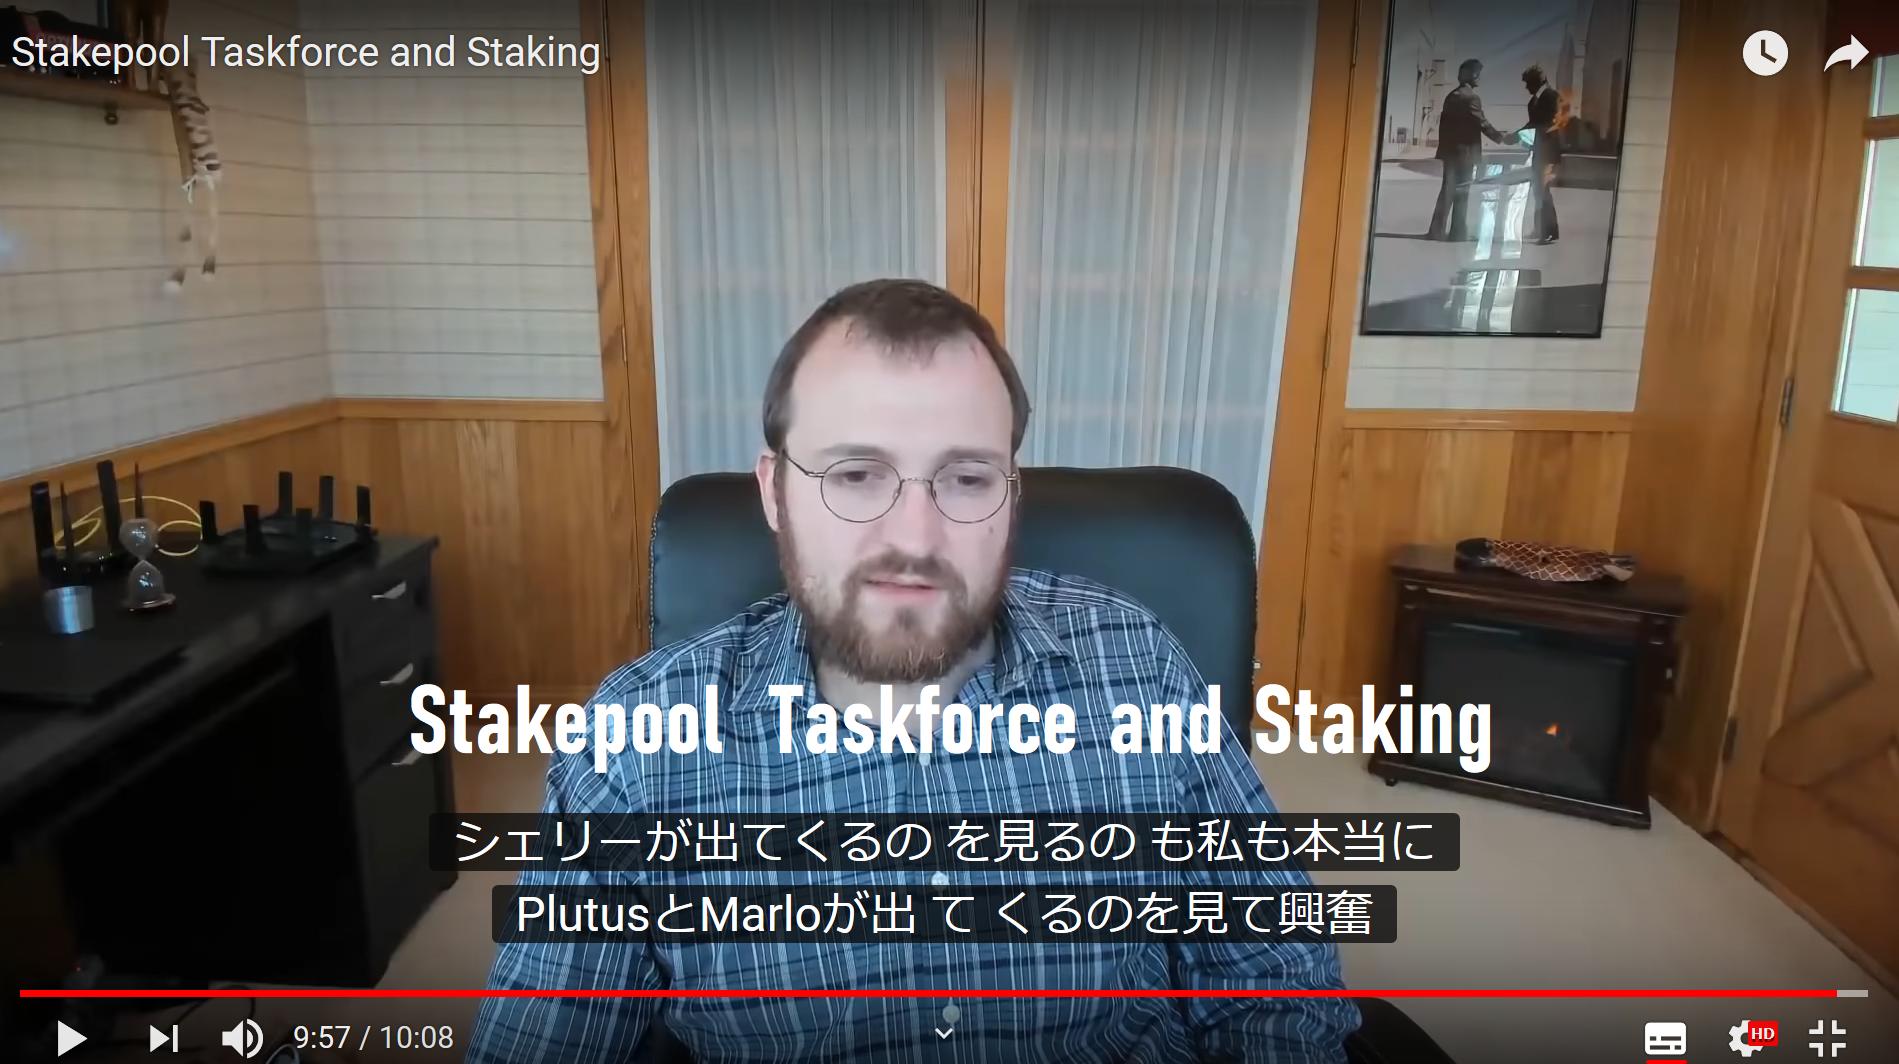 Stakepool Taskforce and Staking